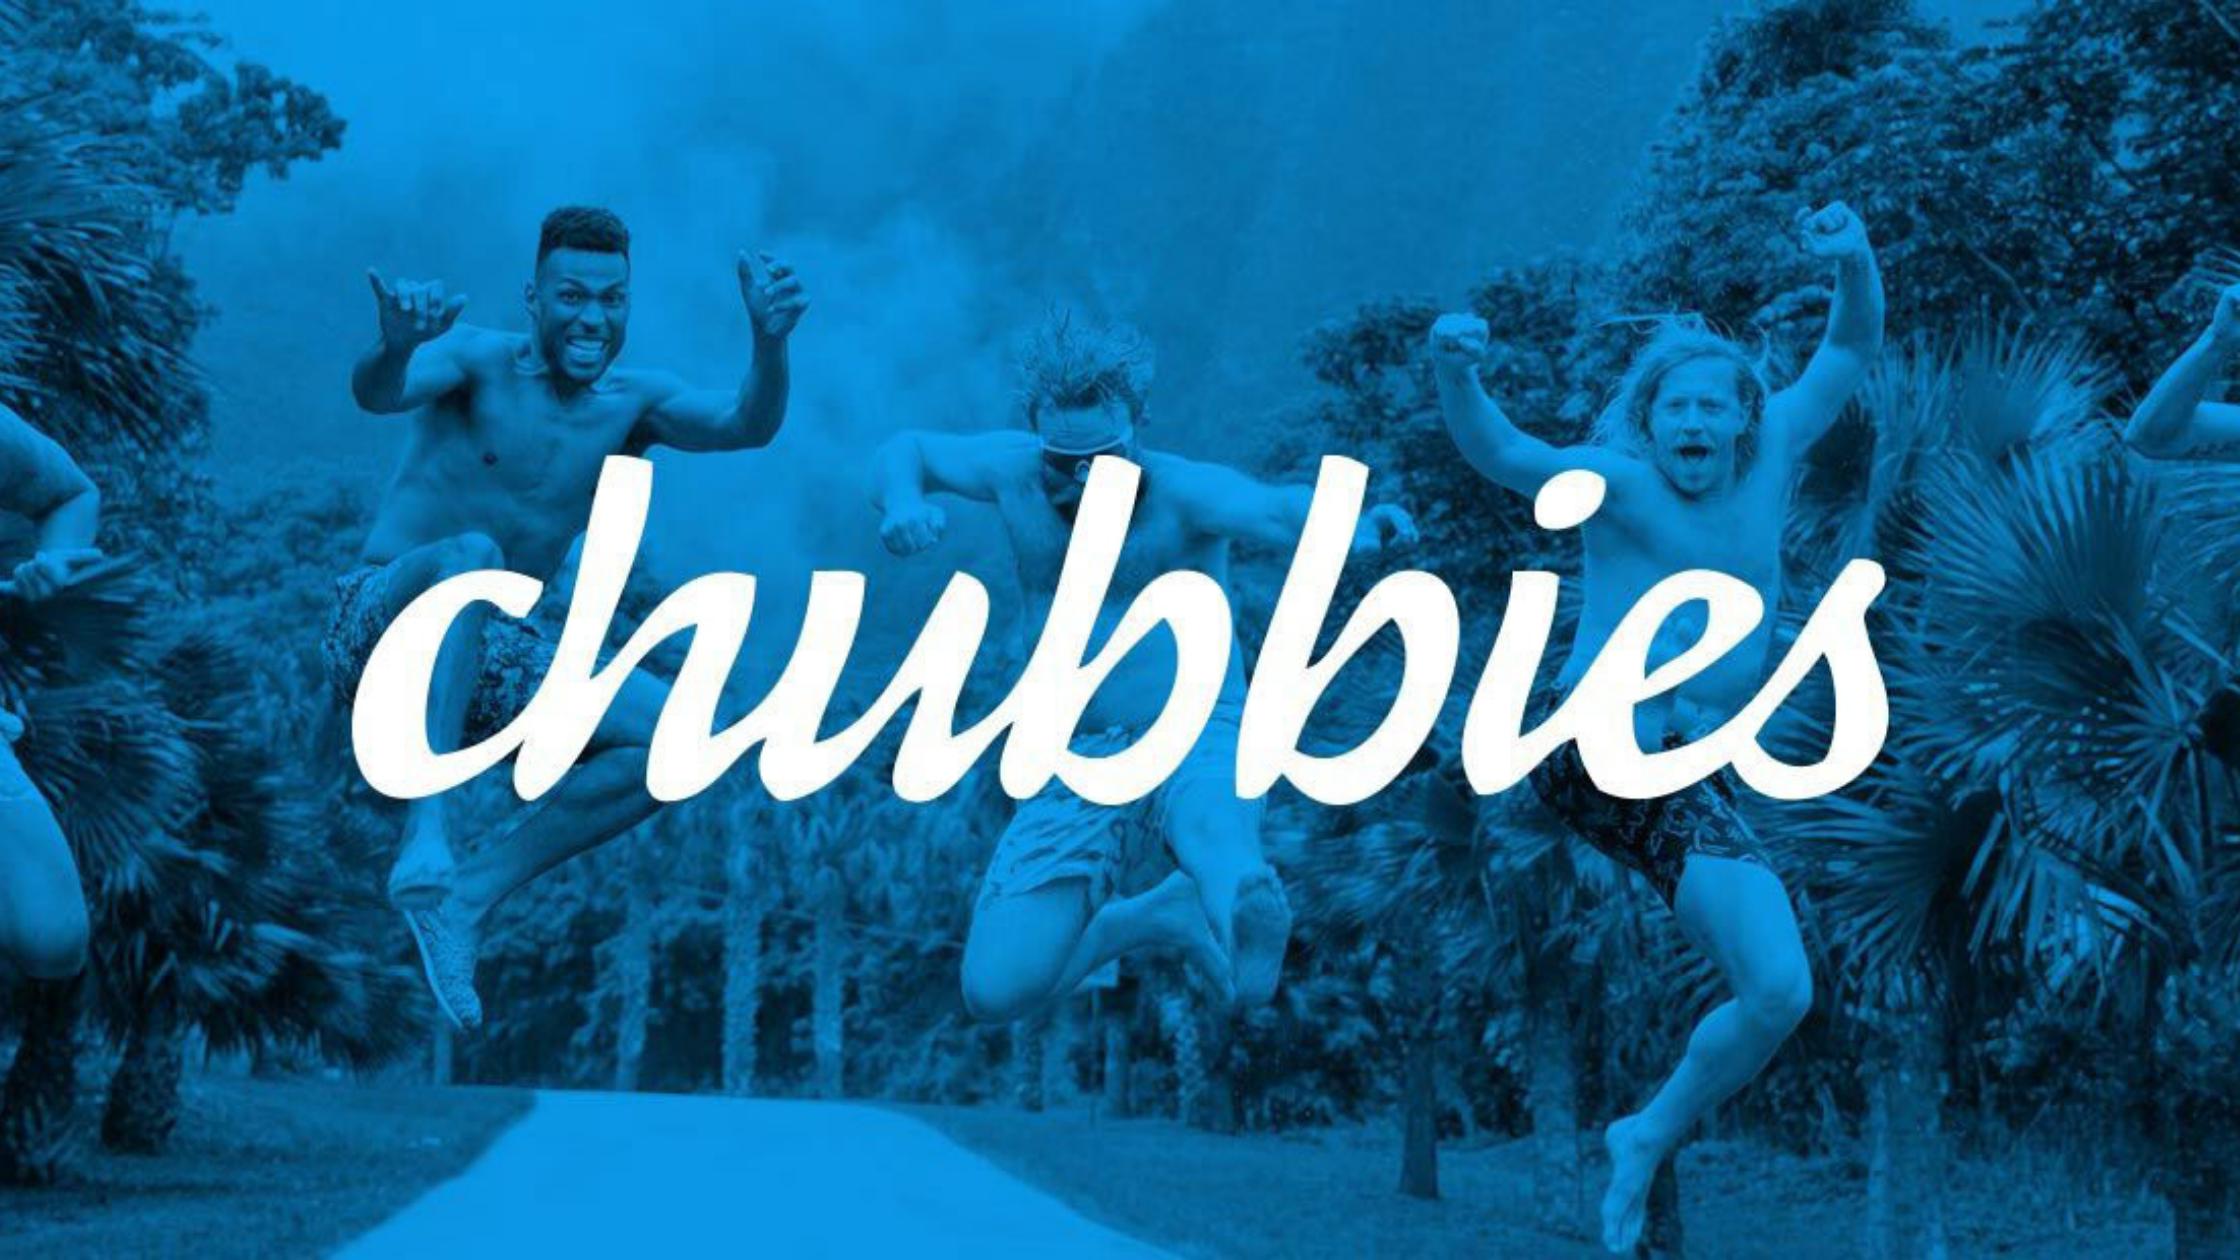 Chubbies brand image